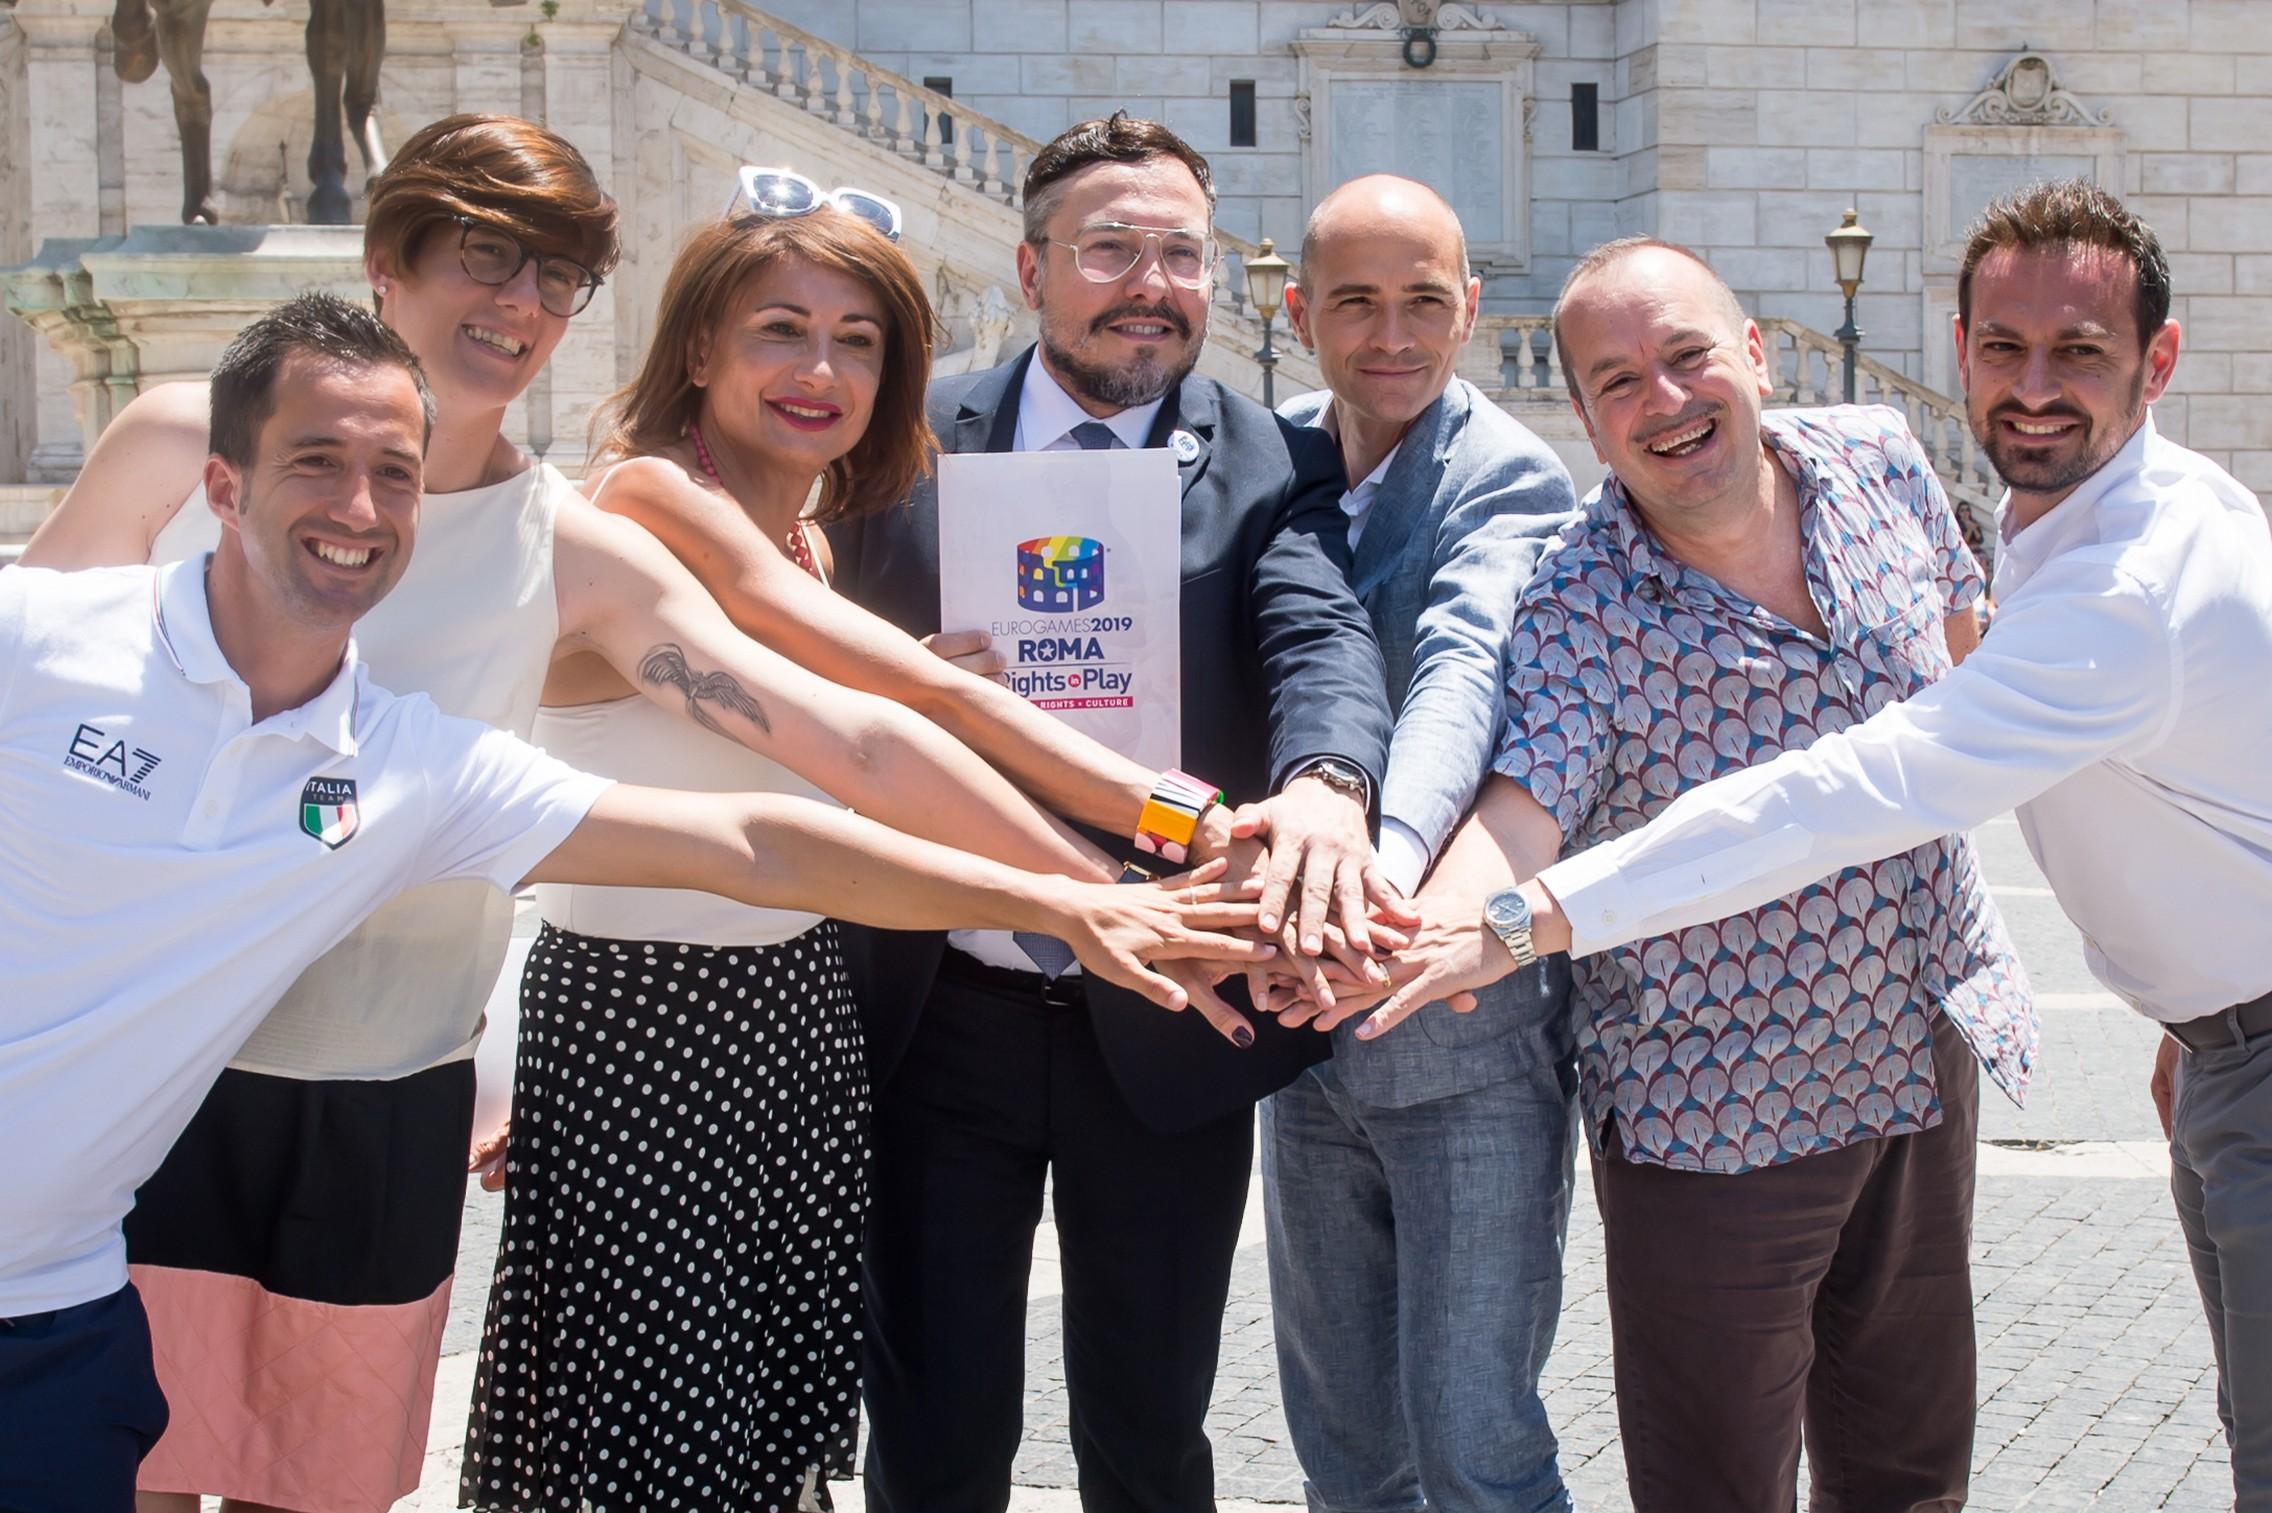 eurogames 2019 roma zerkalo spettacolo